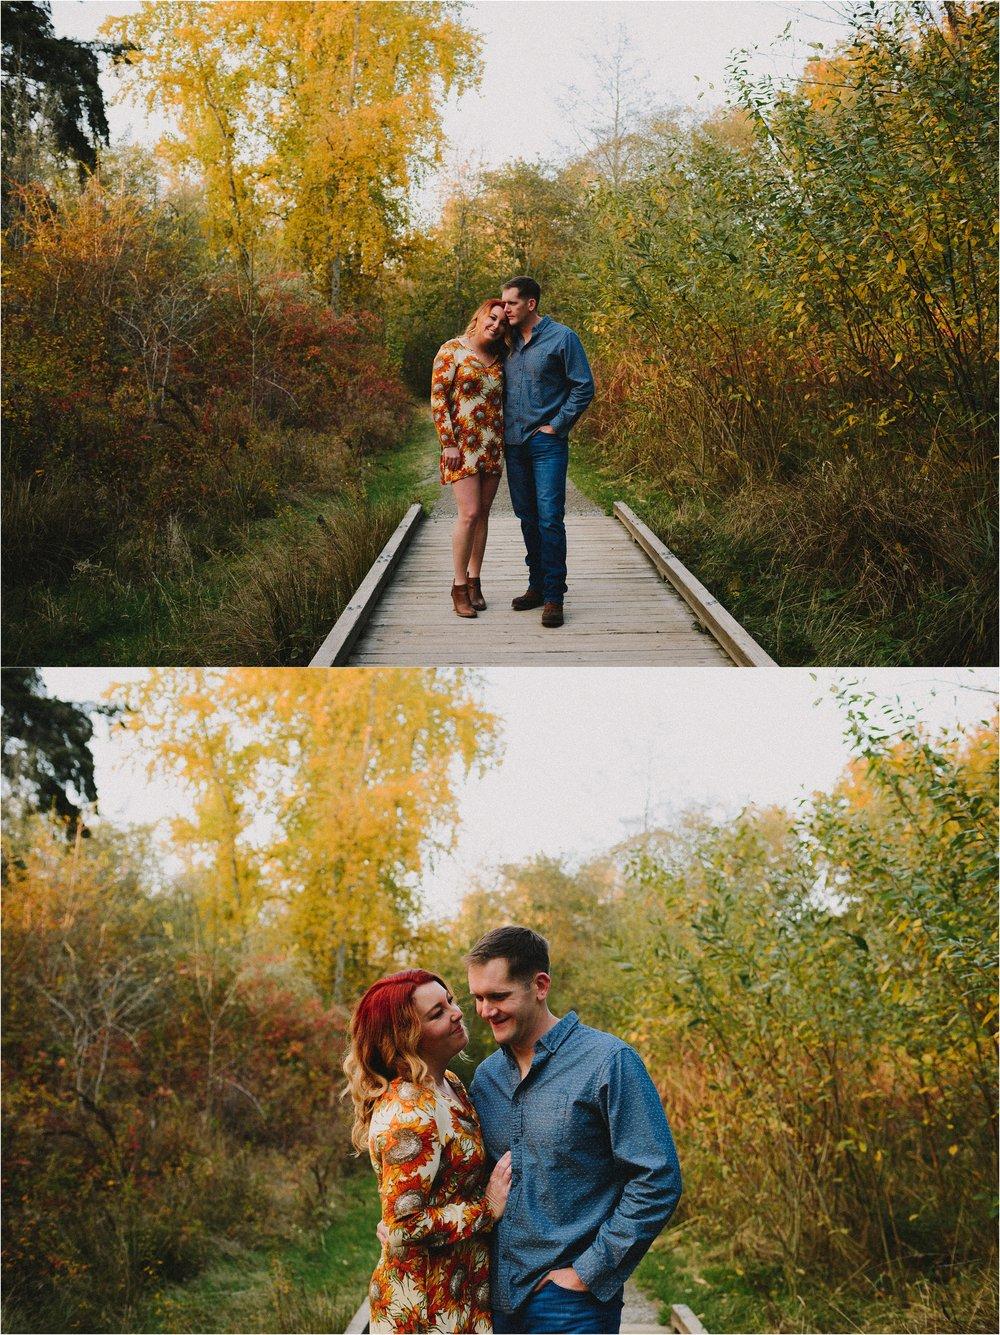 titlow-beach-park-engagement-session-jannicka-mayte-anchorage-alaska-wedding-photographer_0011.jpg